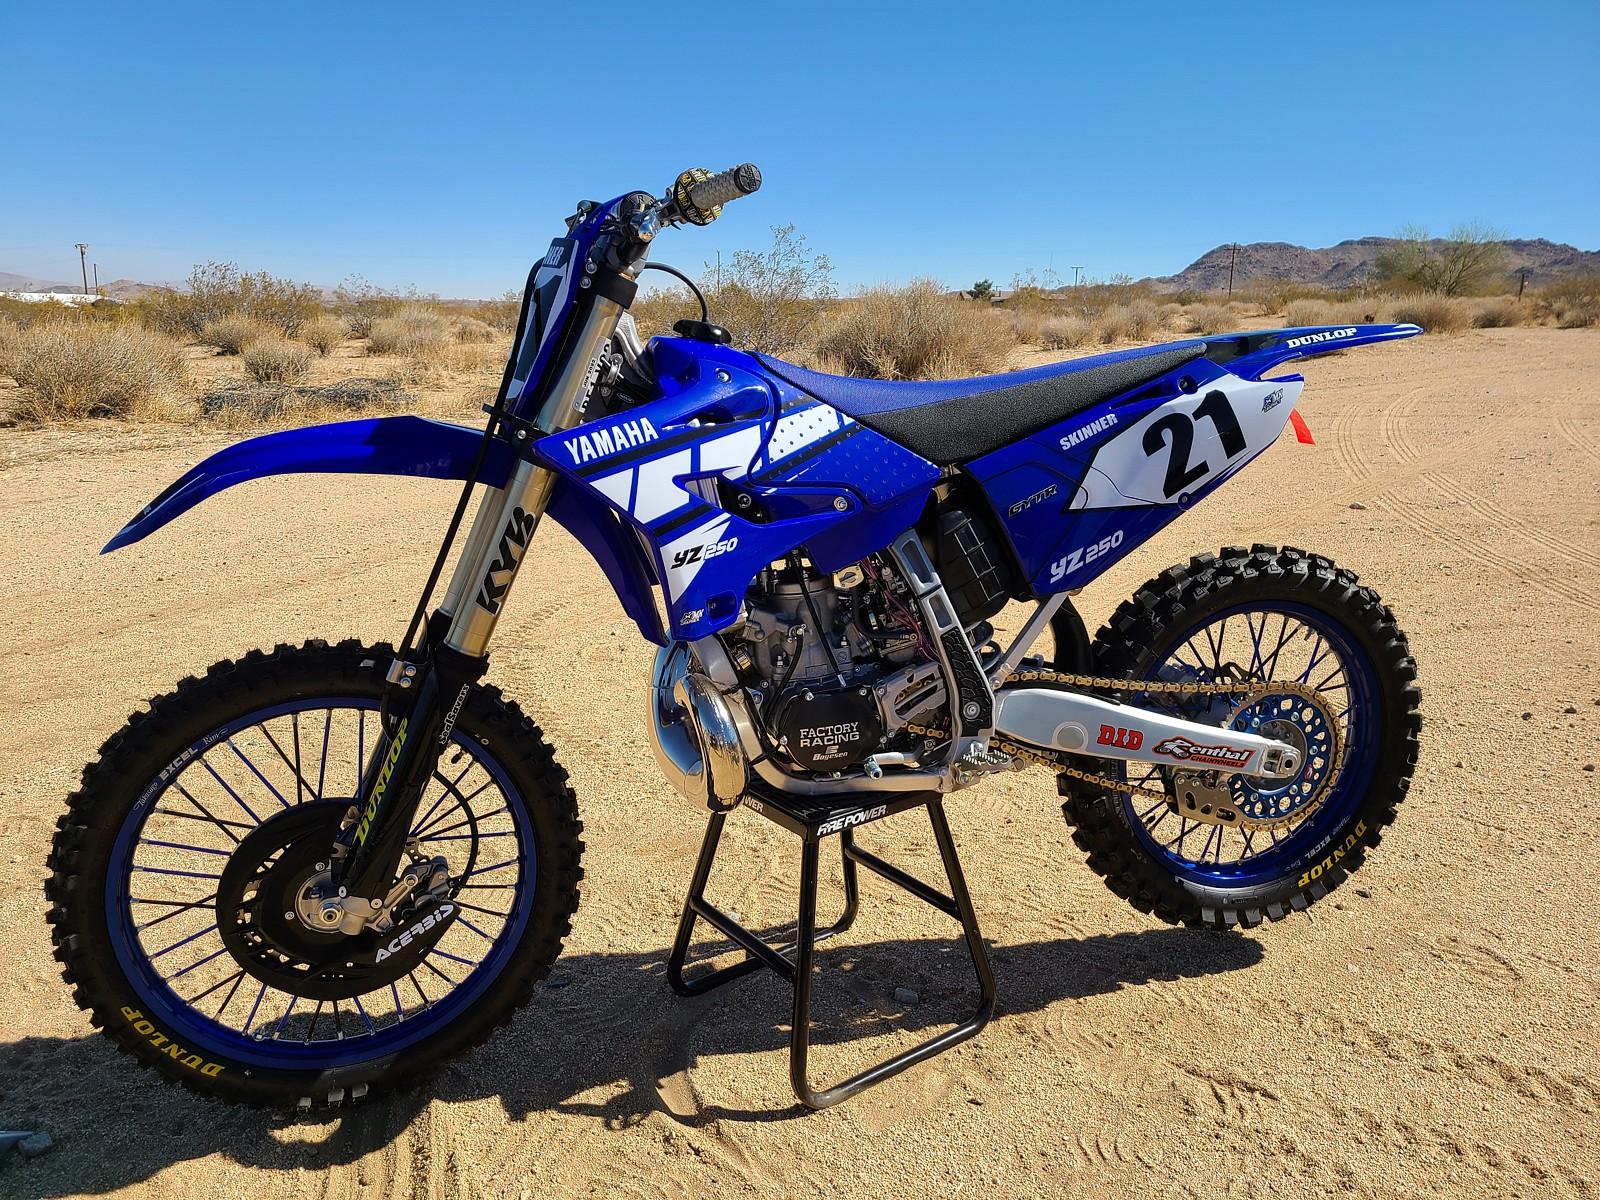 20210220 113648 - Hypersmash - Motocross Pictures - Vital MX